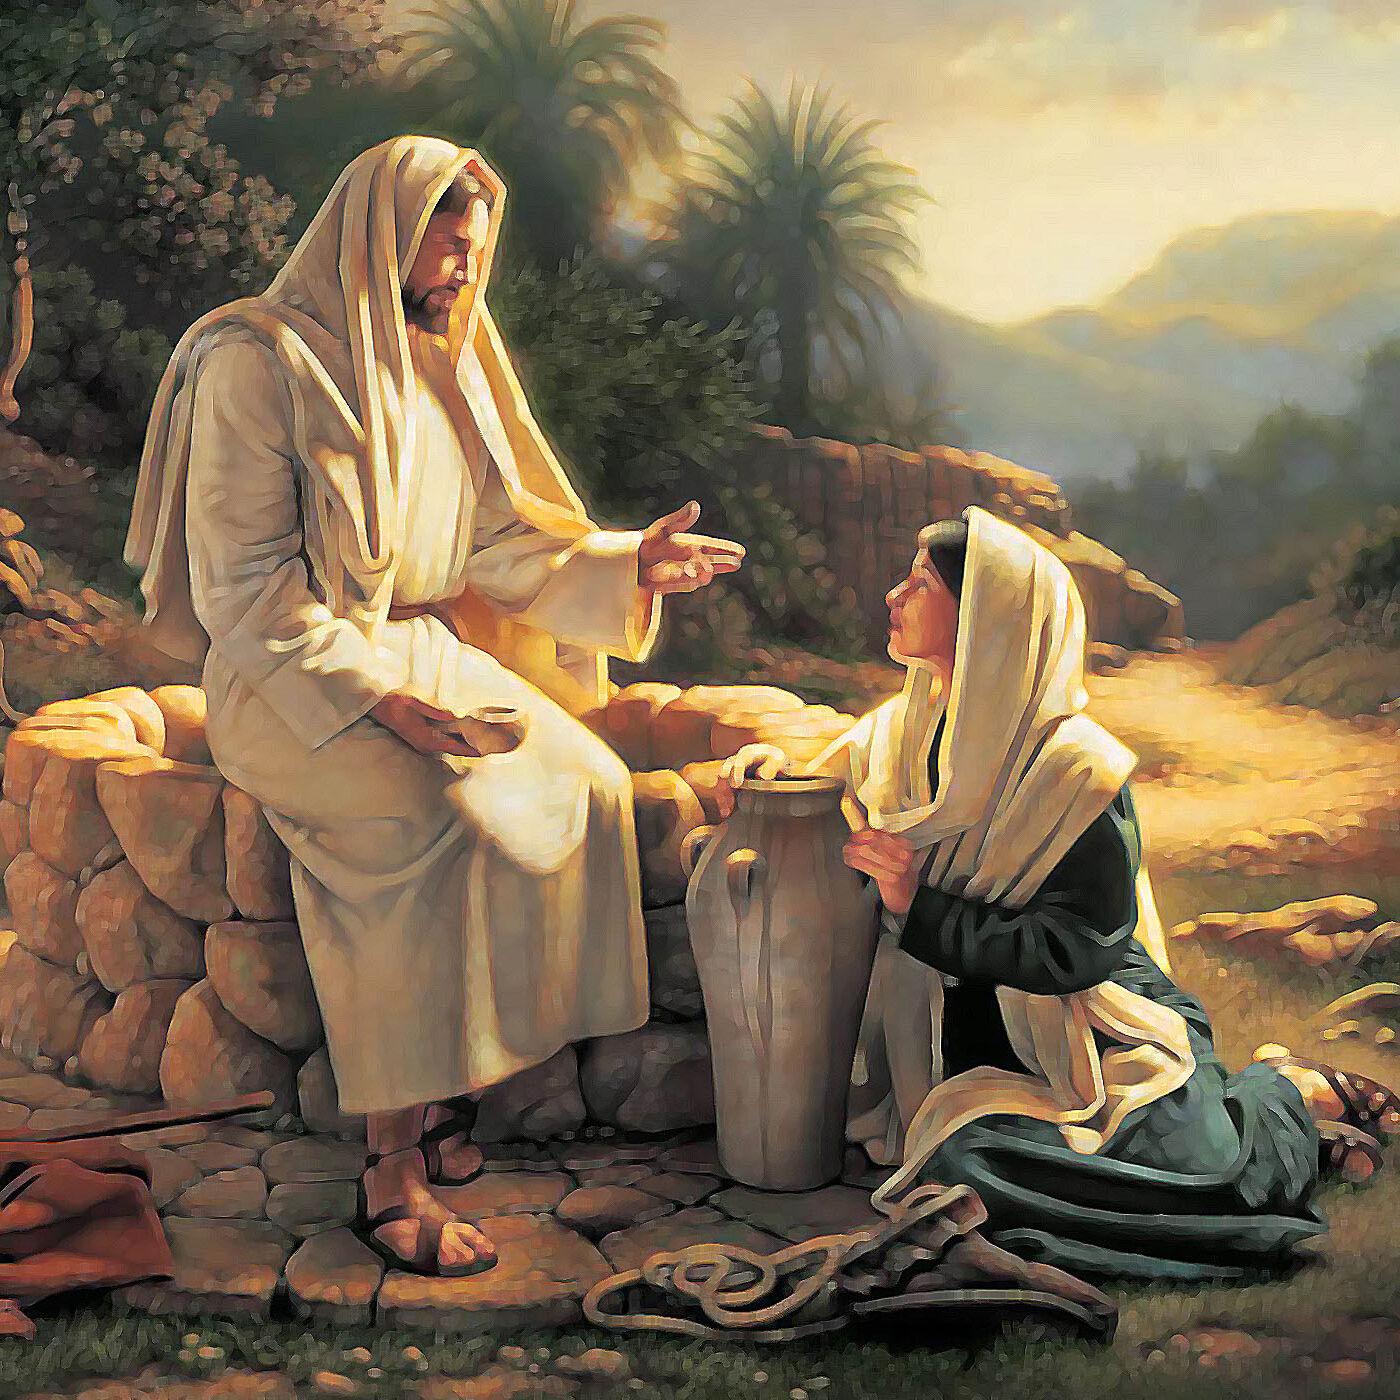 riflessioni sul Vangelo di Venerdì 16 Ottobre 2020 (Lc 12, 1-7)